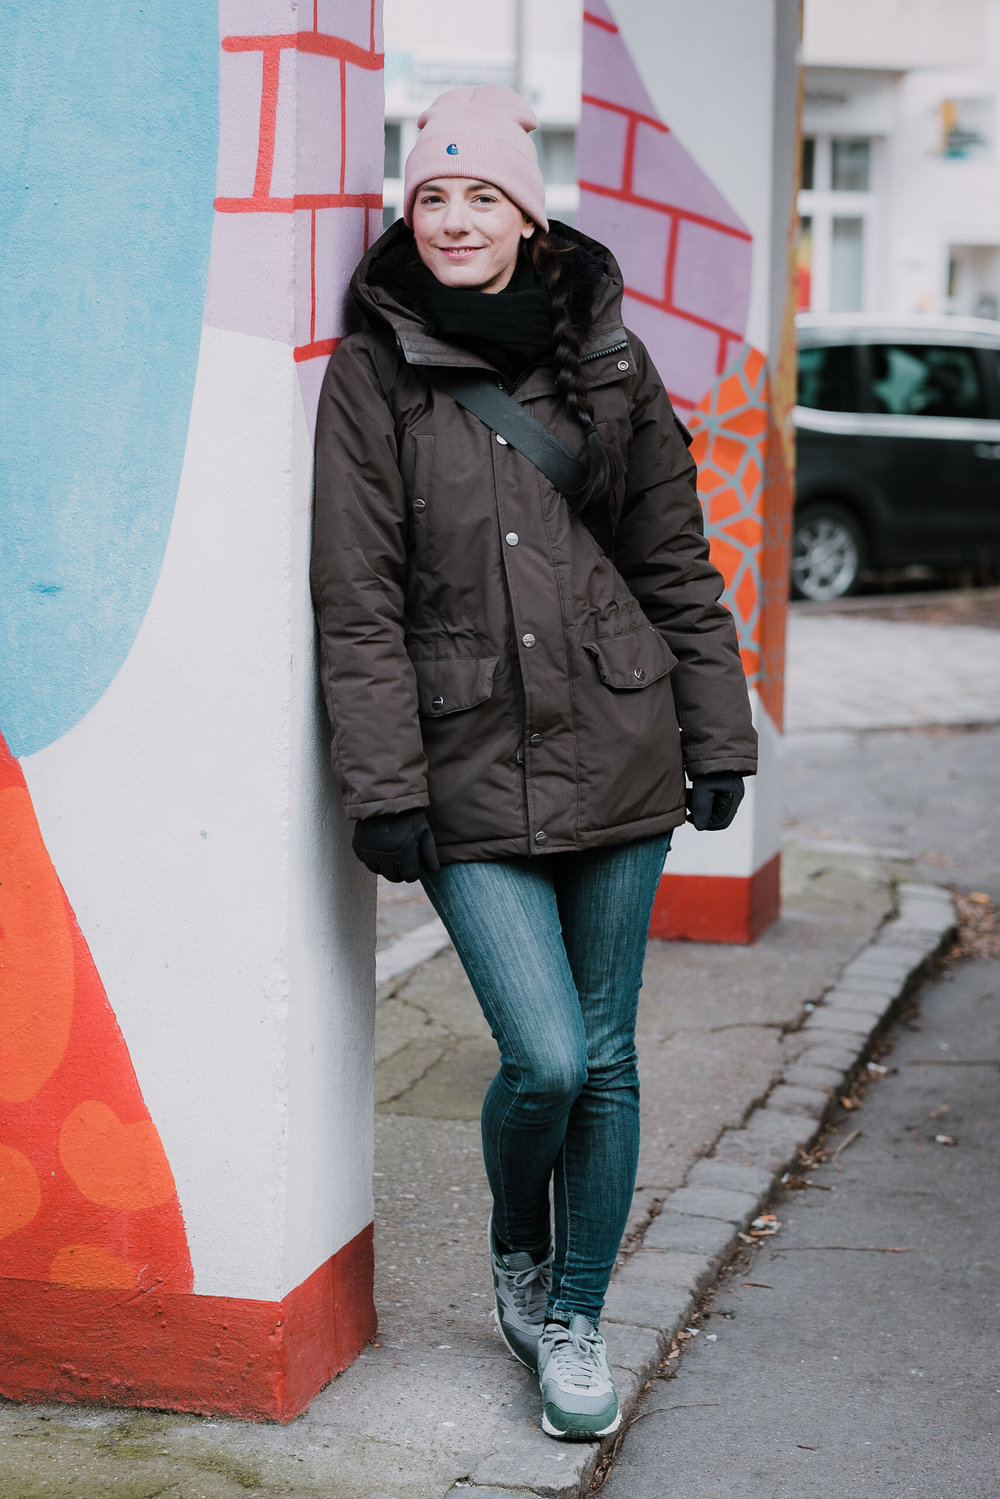 Fototagebuch_Januar_058.jpg